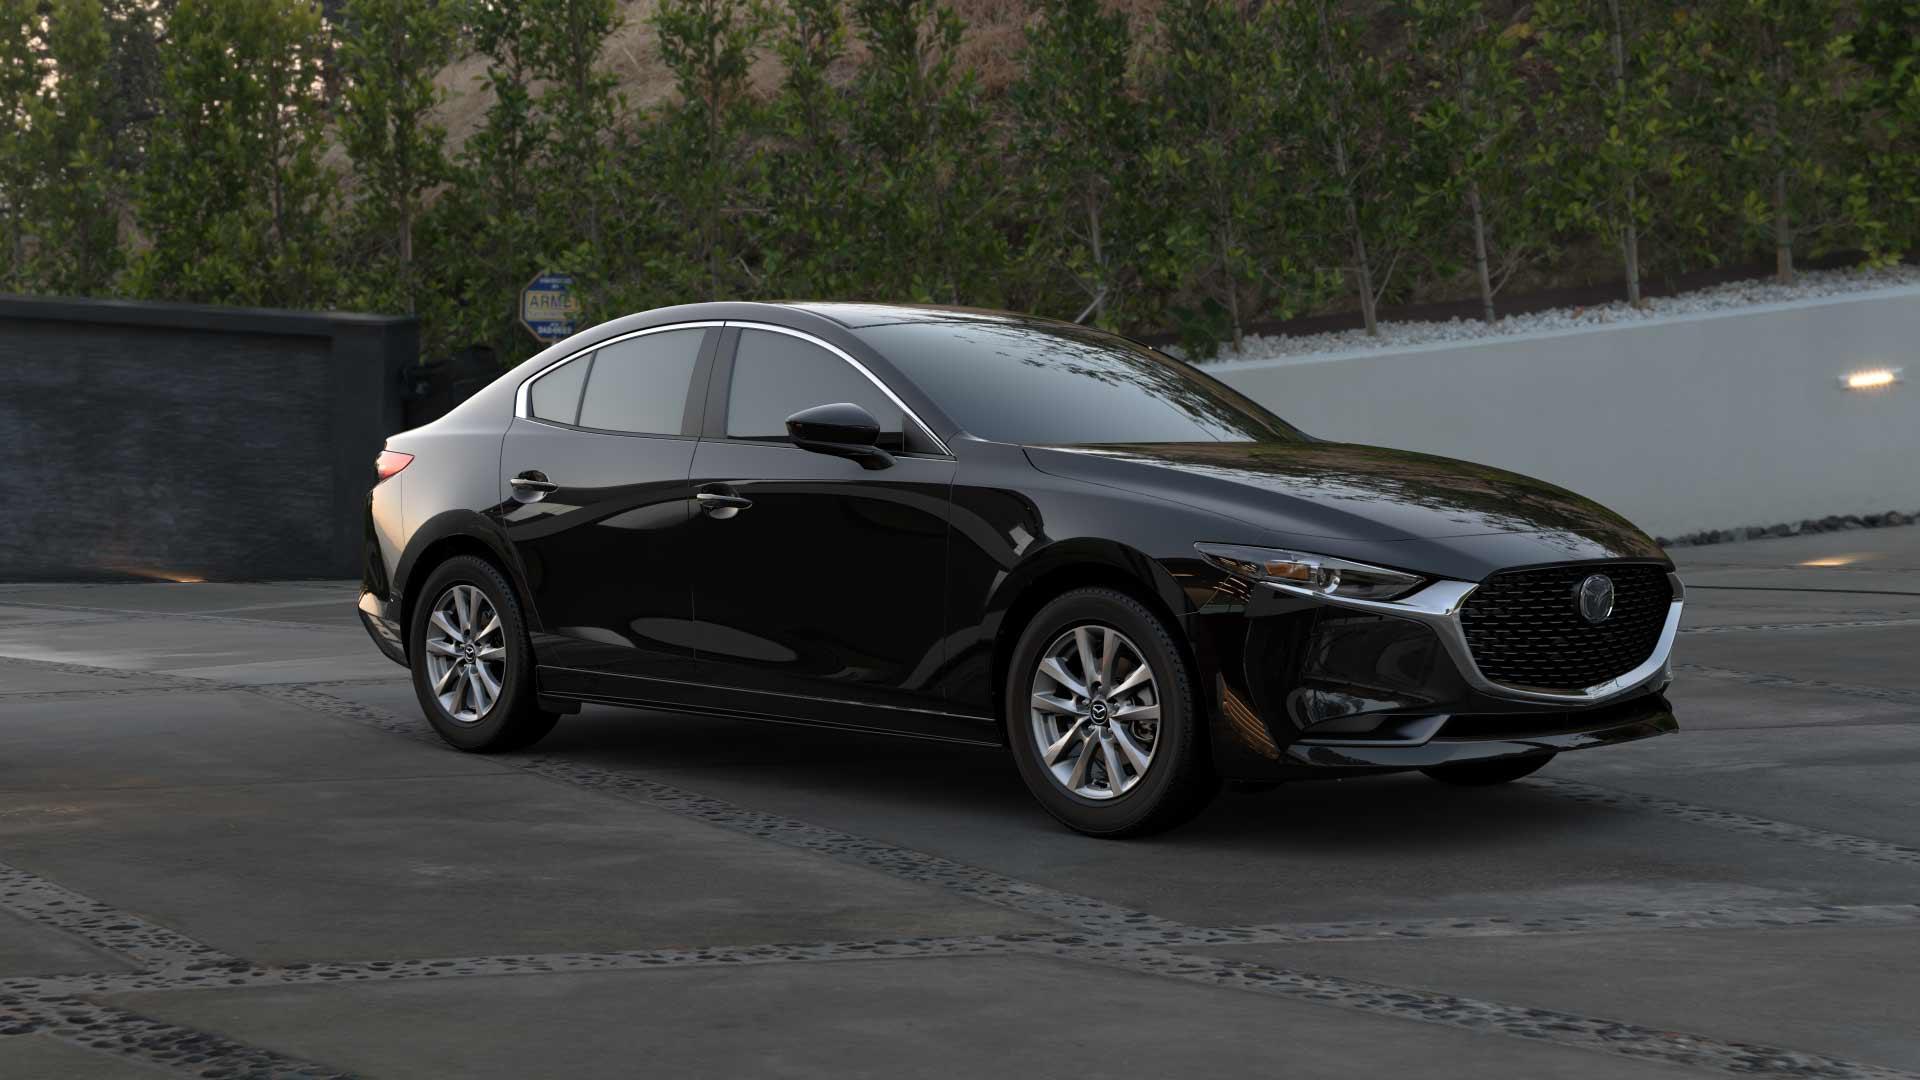 Kelebihan Mazda Z3 Tangguh